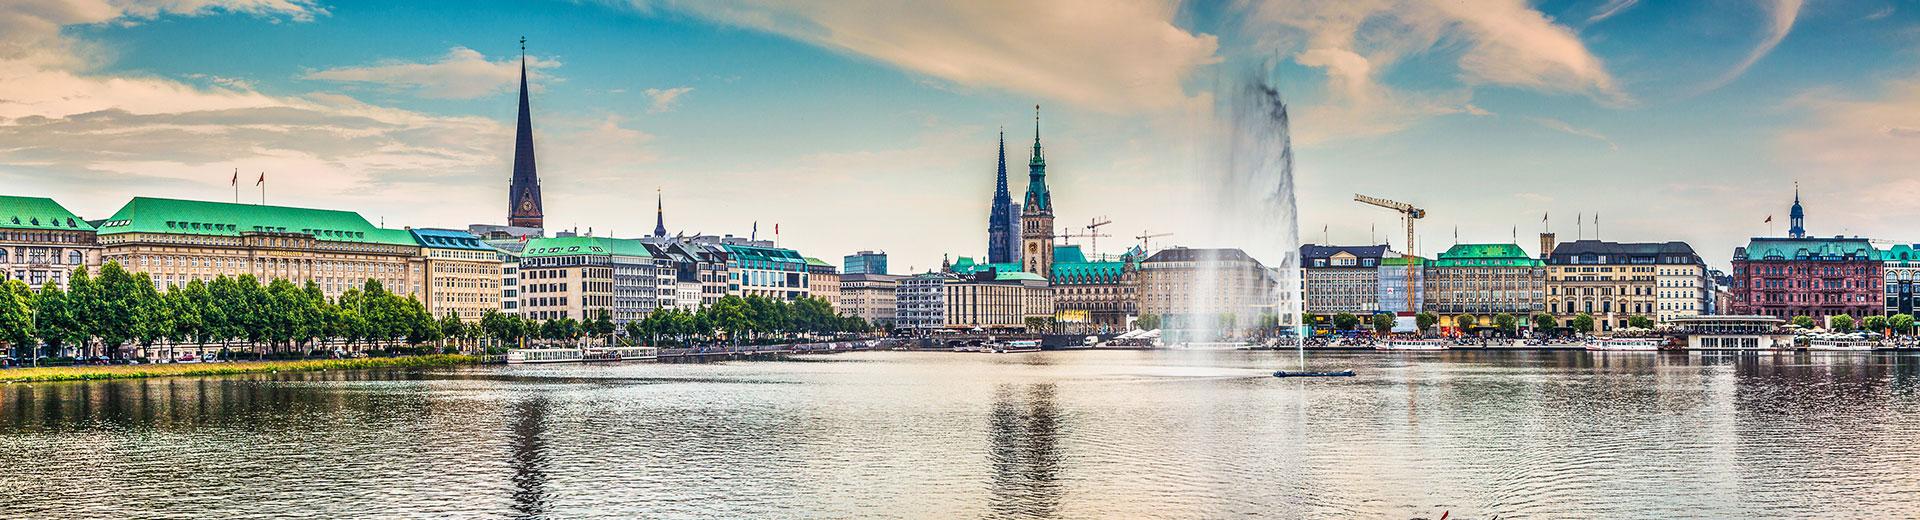 Gruppenreise Hamburg - Package Gruppen Budget Flug